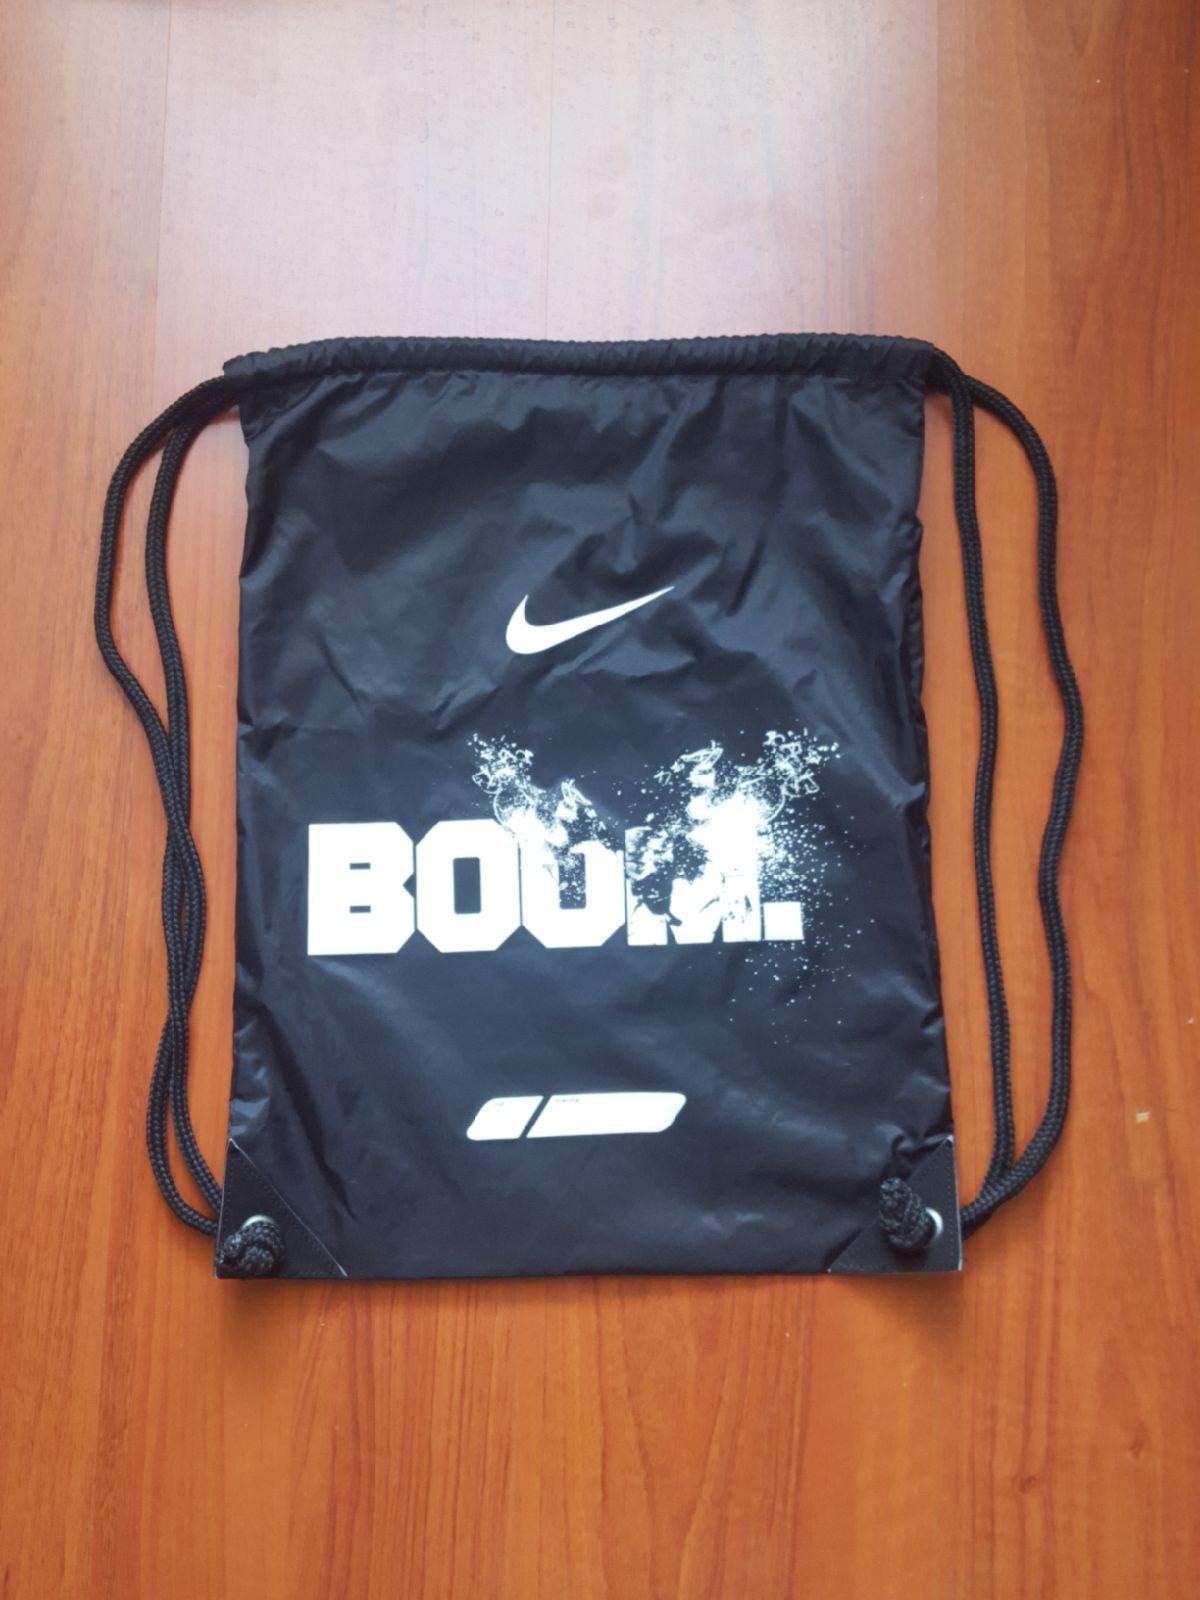 Nike boom Drawstring black backpack